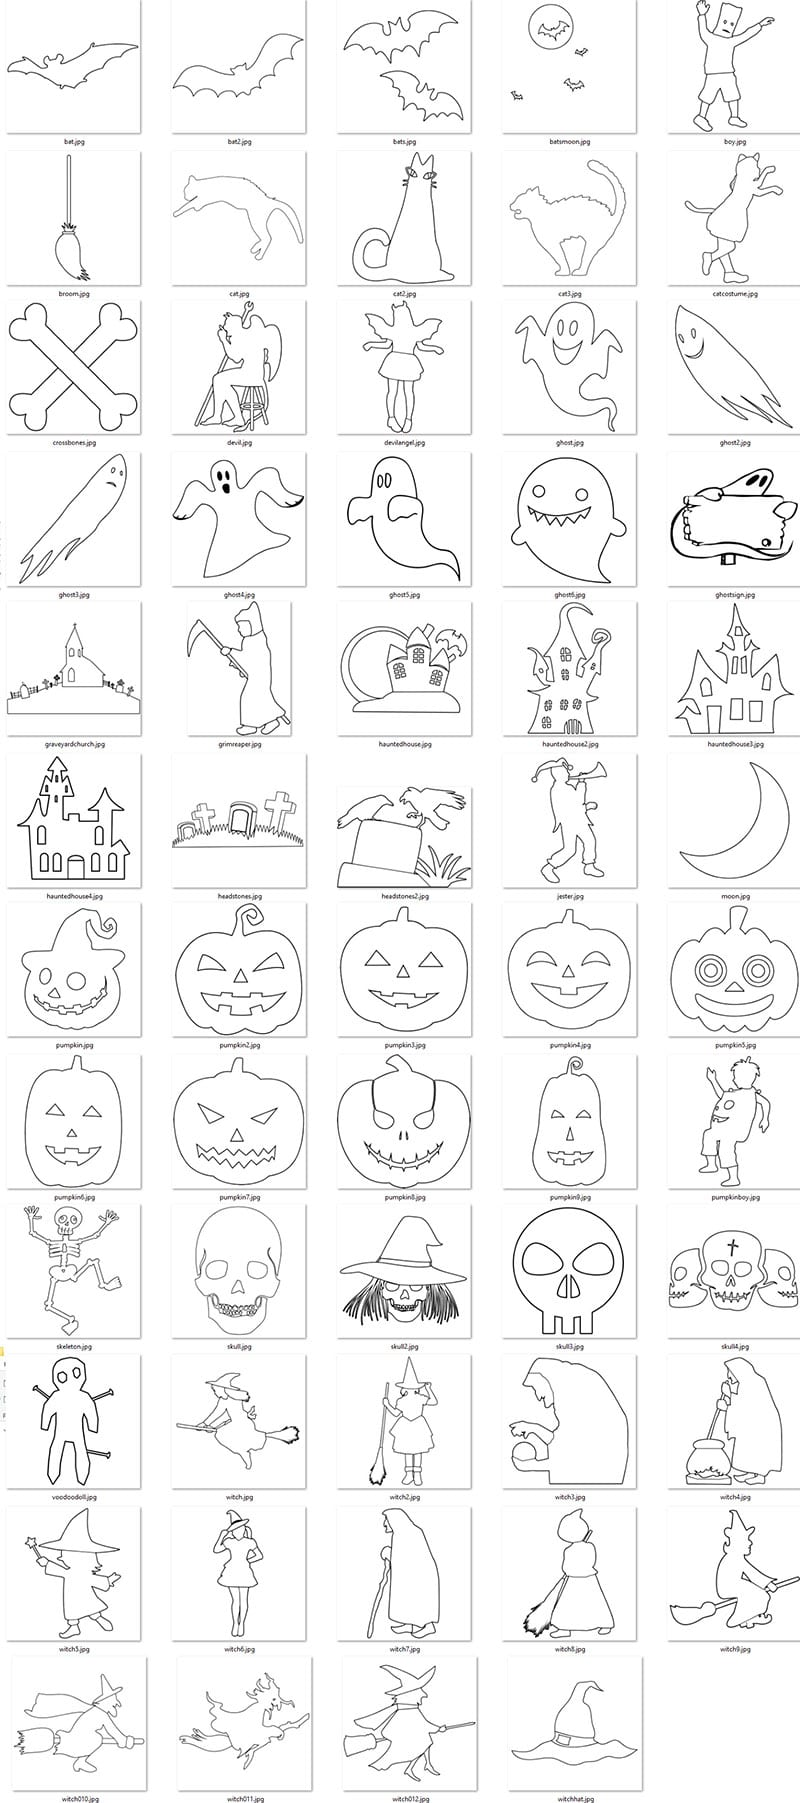 plr coloring pages - photo#8